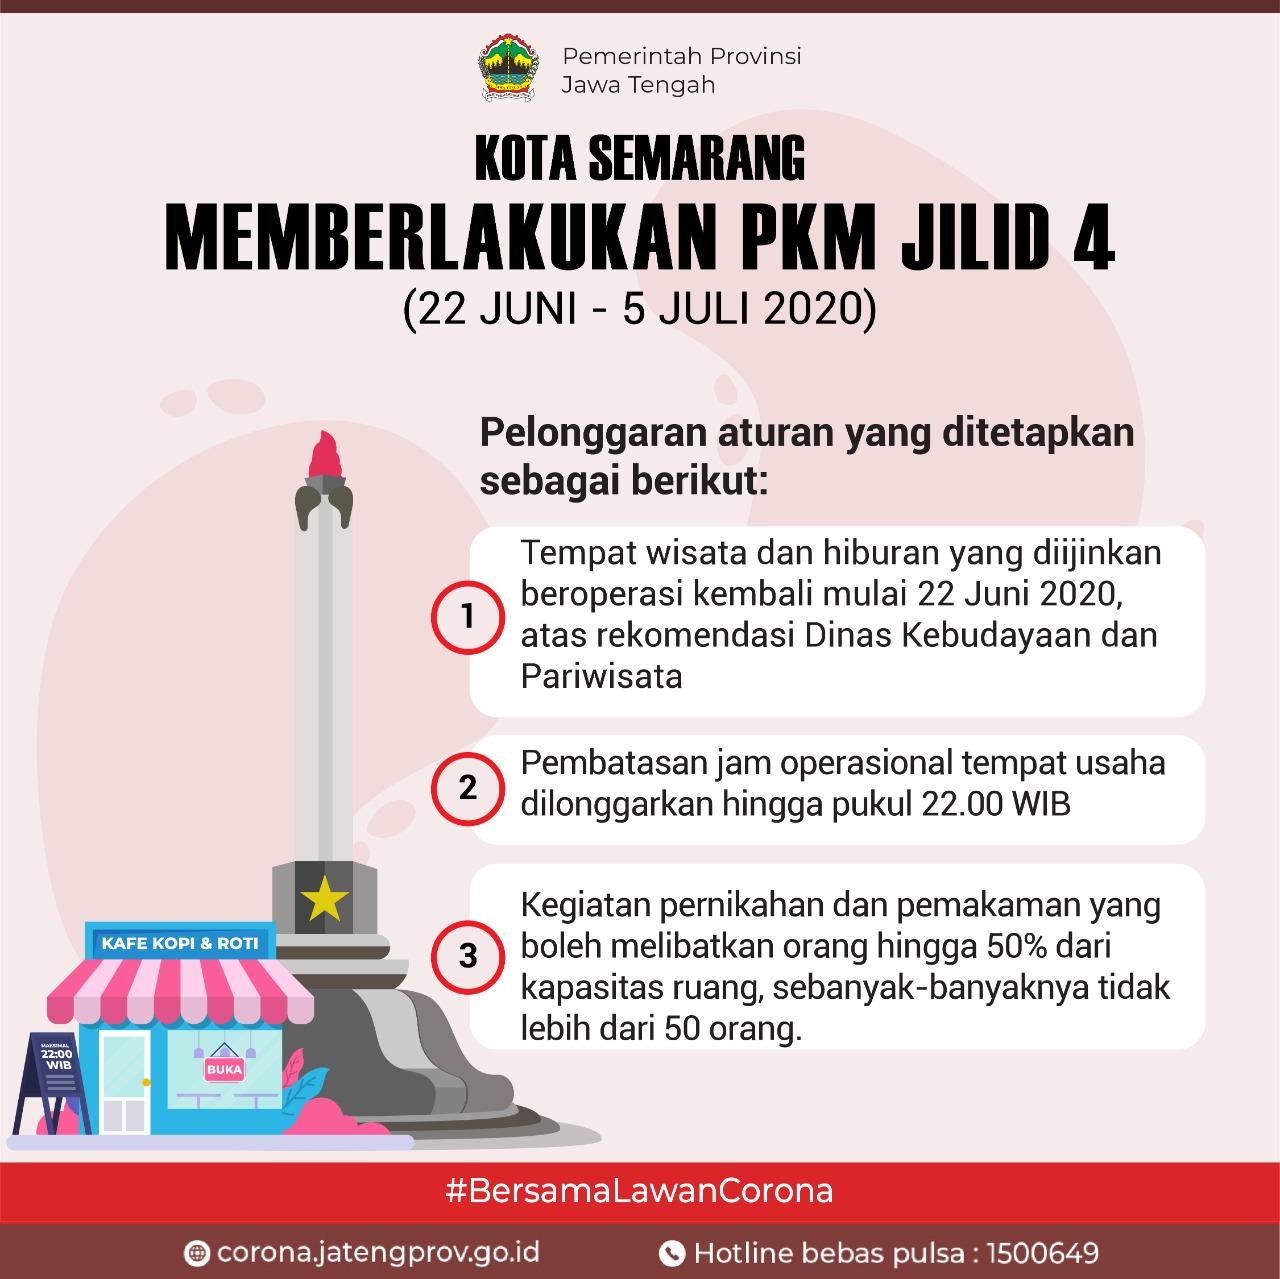 PKM Kota Semarang Jilid 4